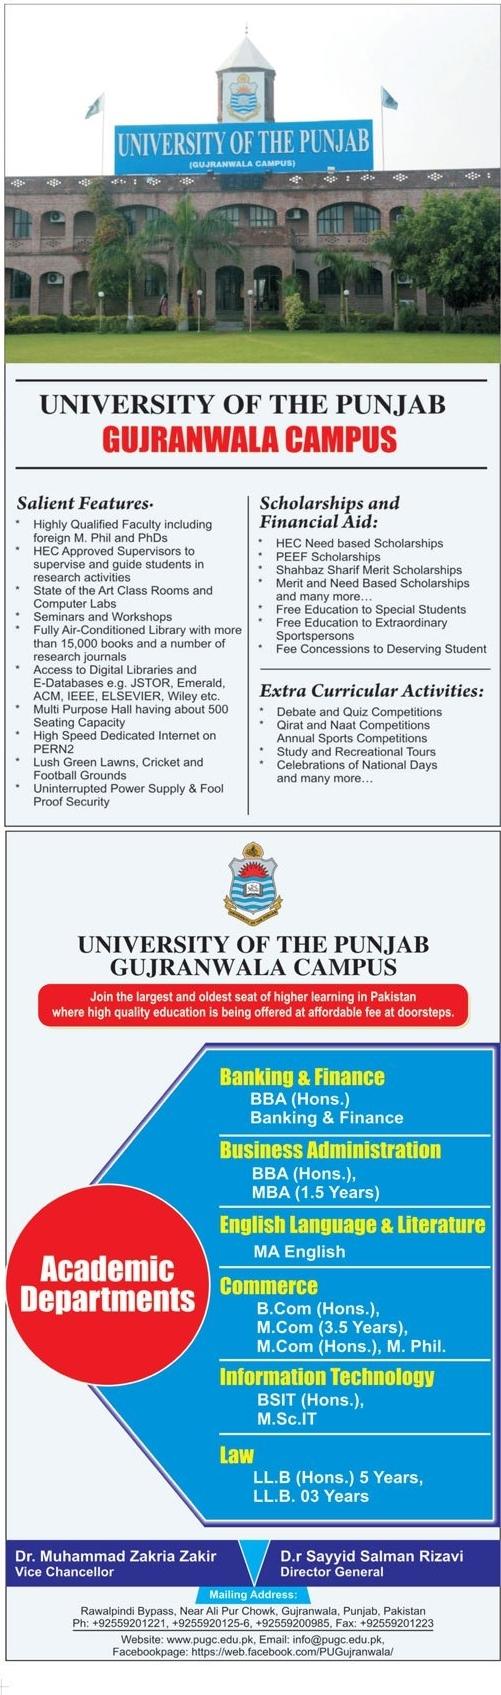 Punjab University Gujranwala Campus Admission 2021